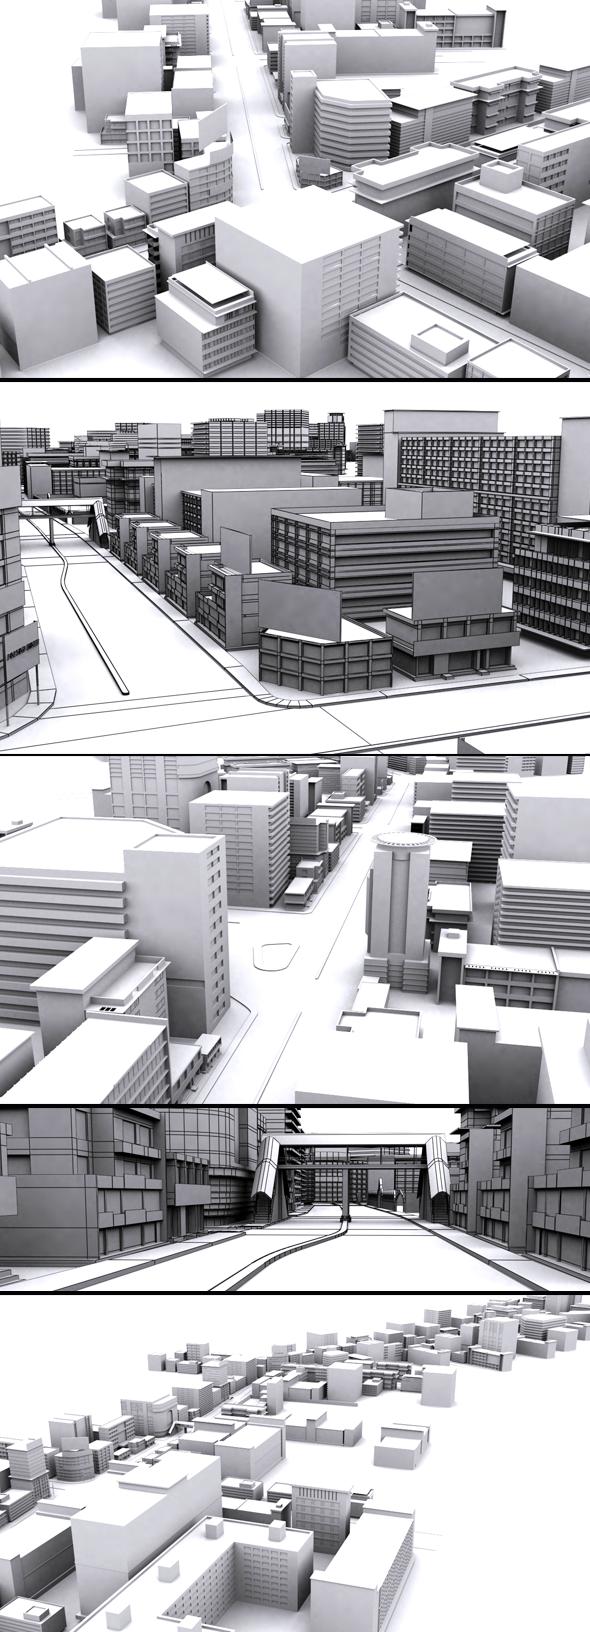 Movie City 3d Model - 3DOcean Item for Sale